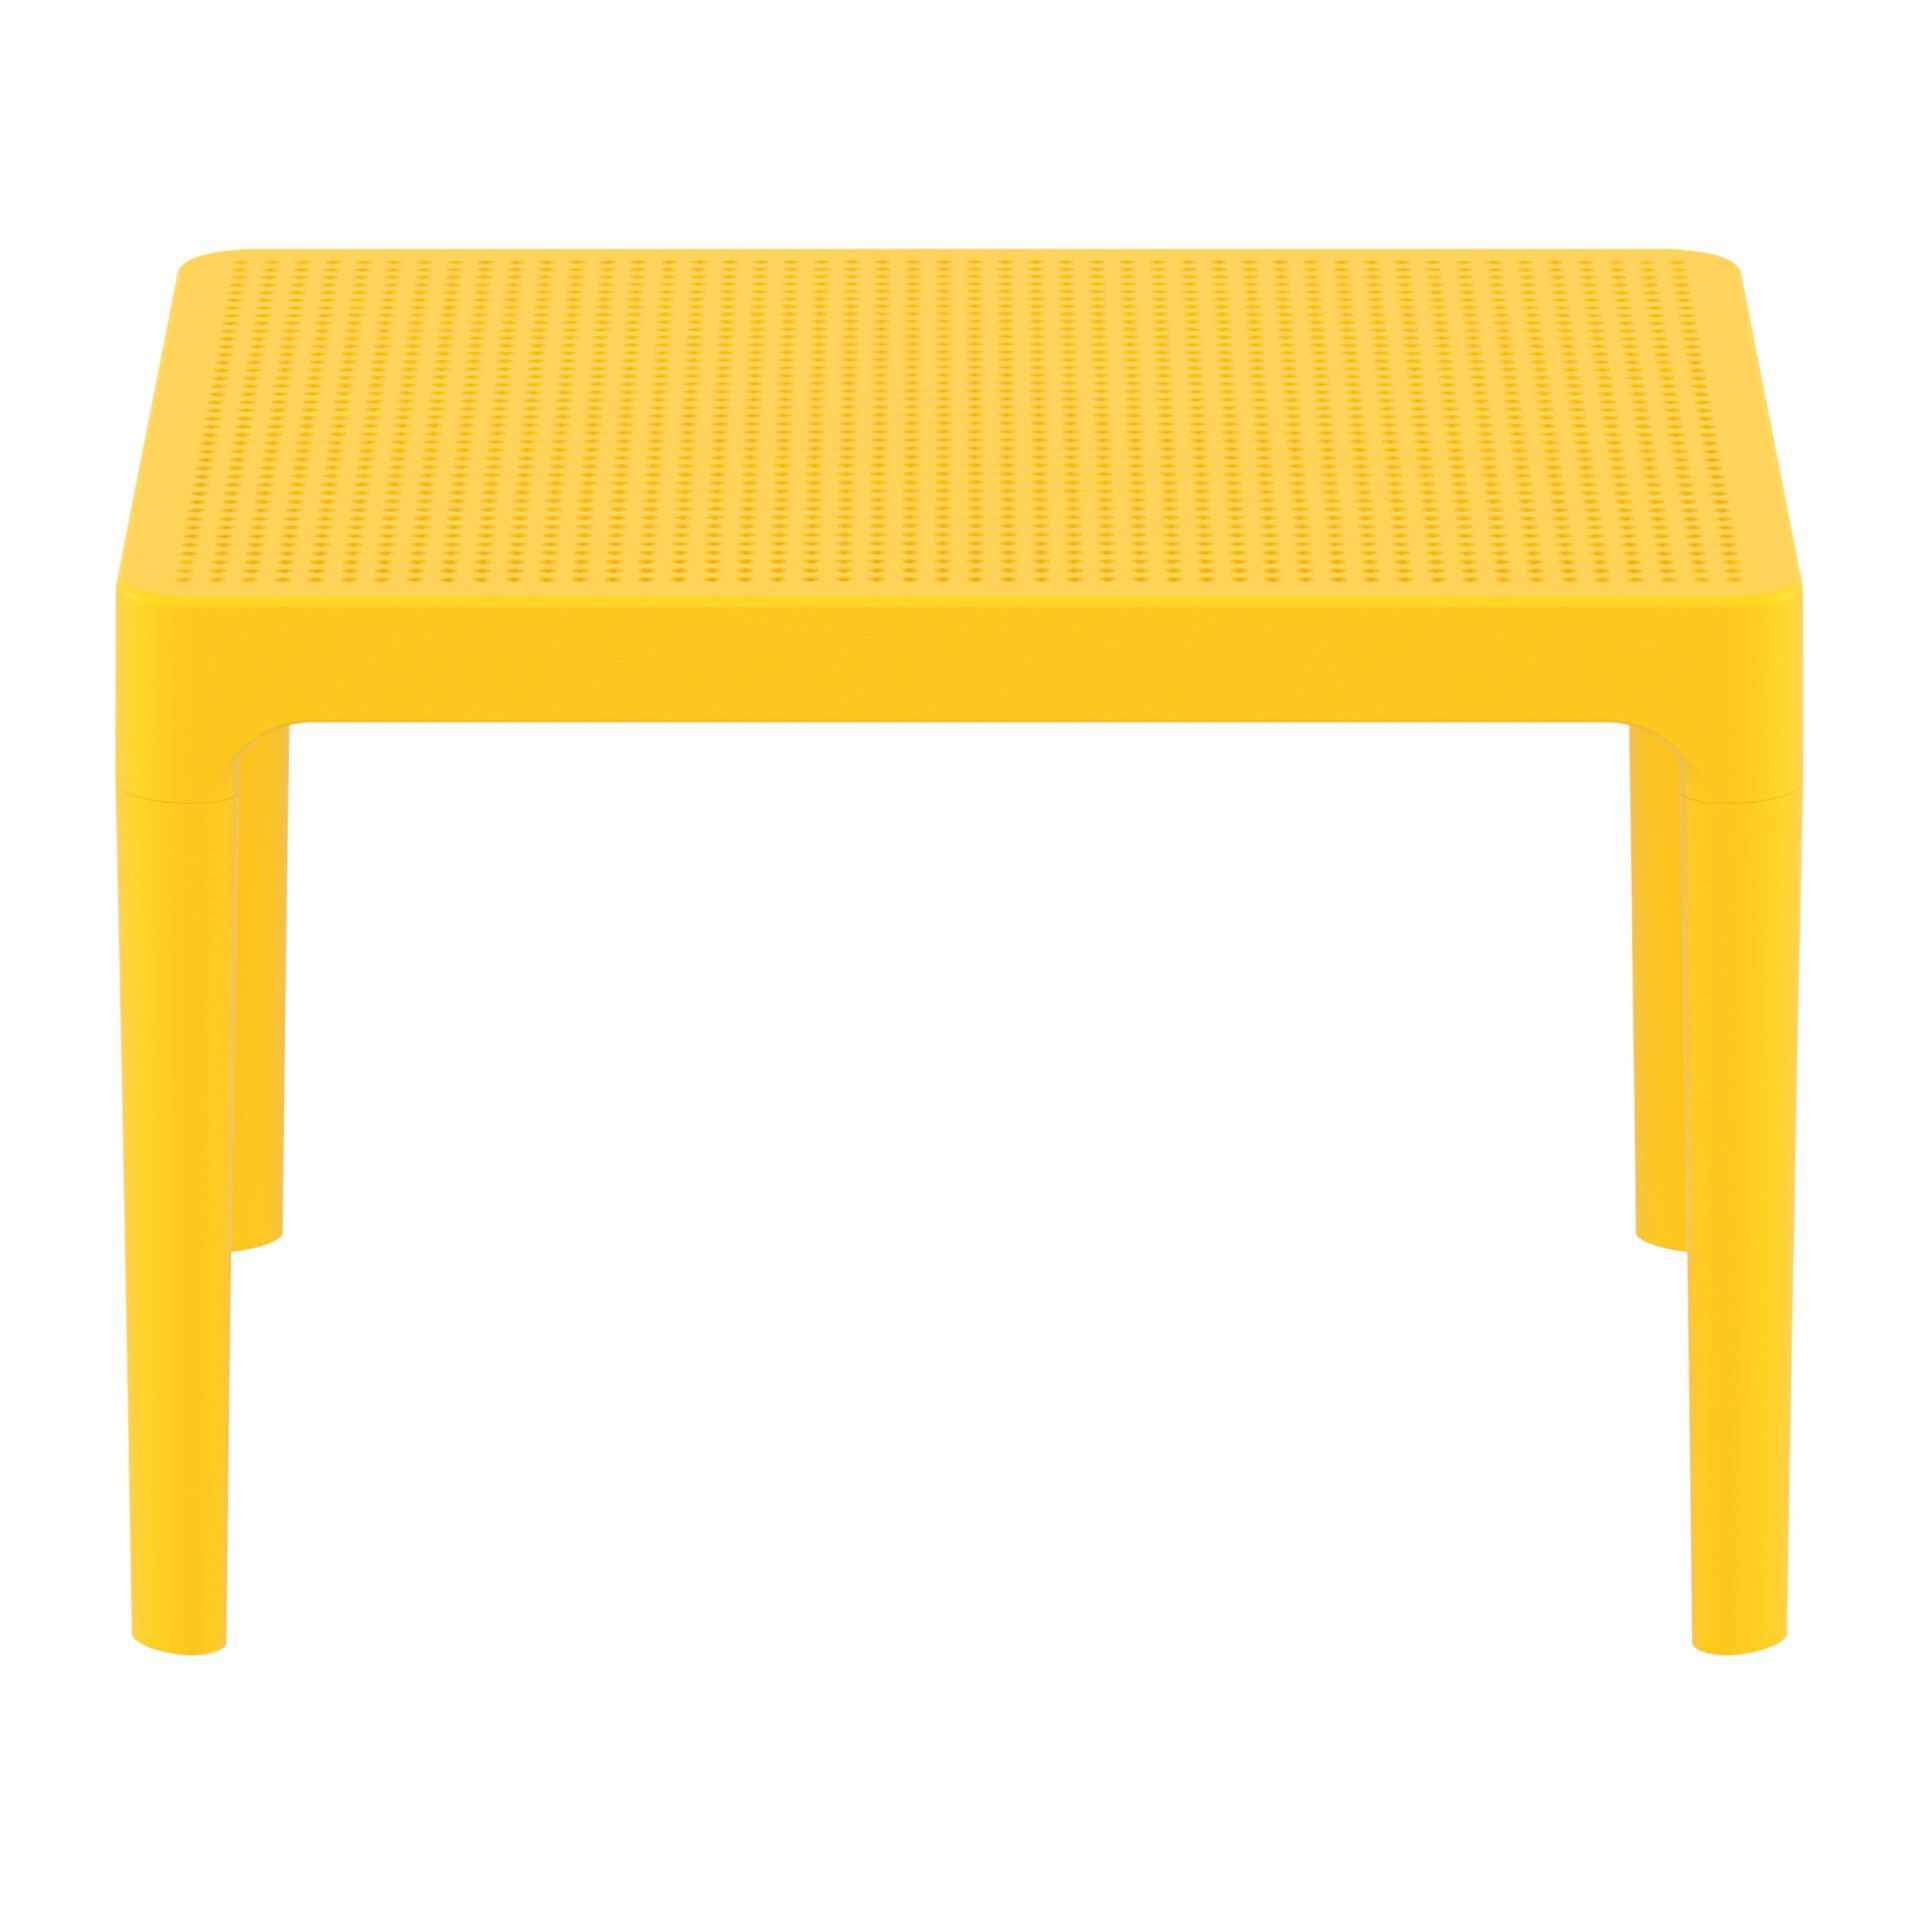 polypropylene outdoor sky side table yellow long edge